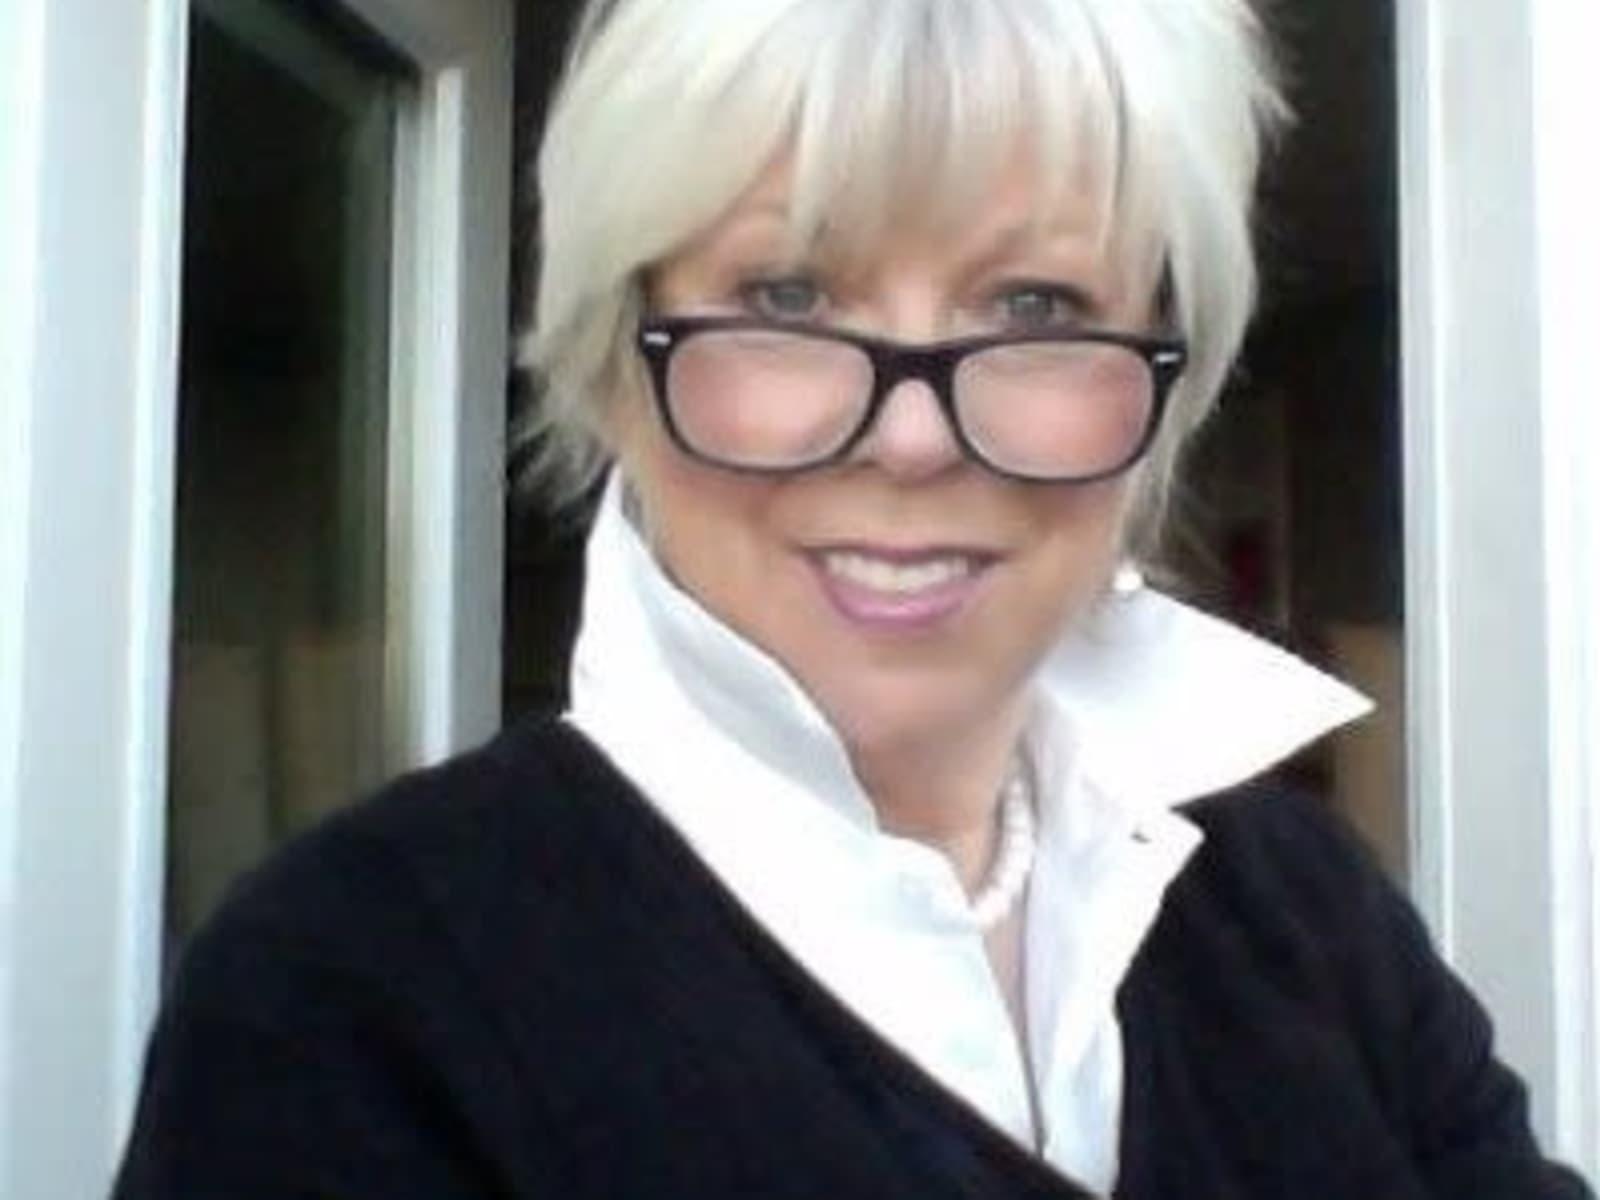 Marsha from Halifax, Nova Scotia, Canada